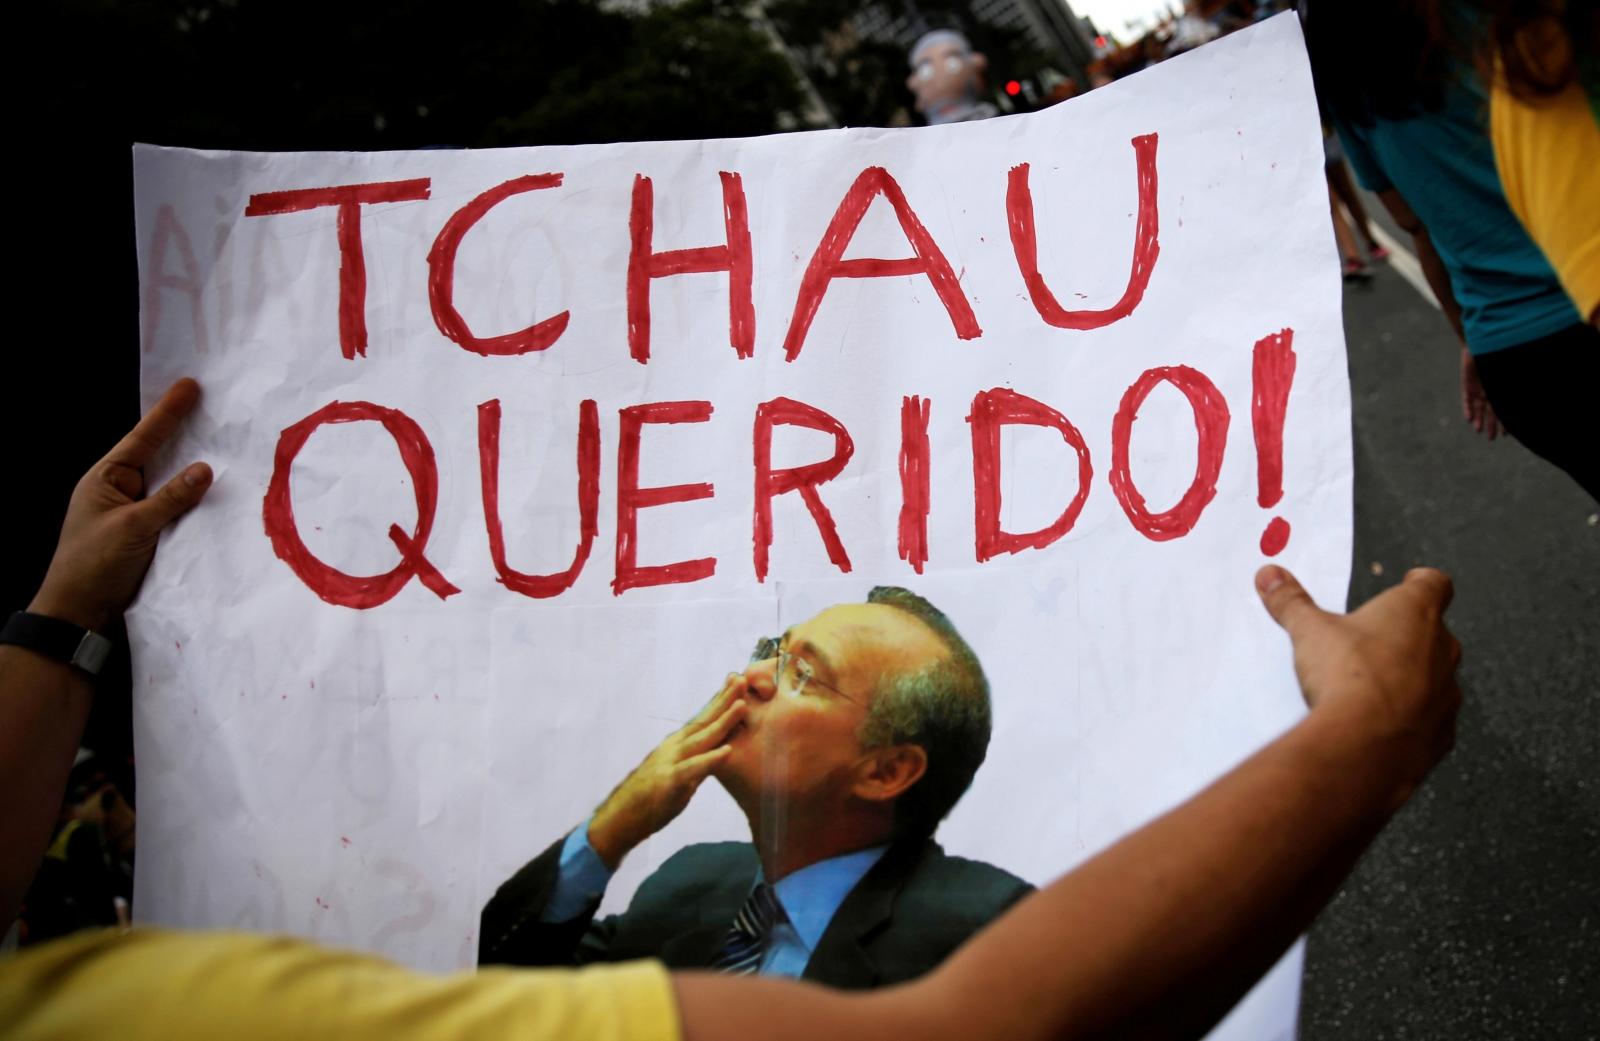 Brazil Senate President Renan Calheiros